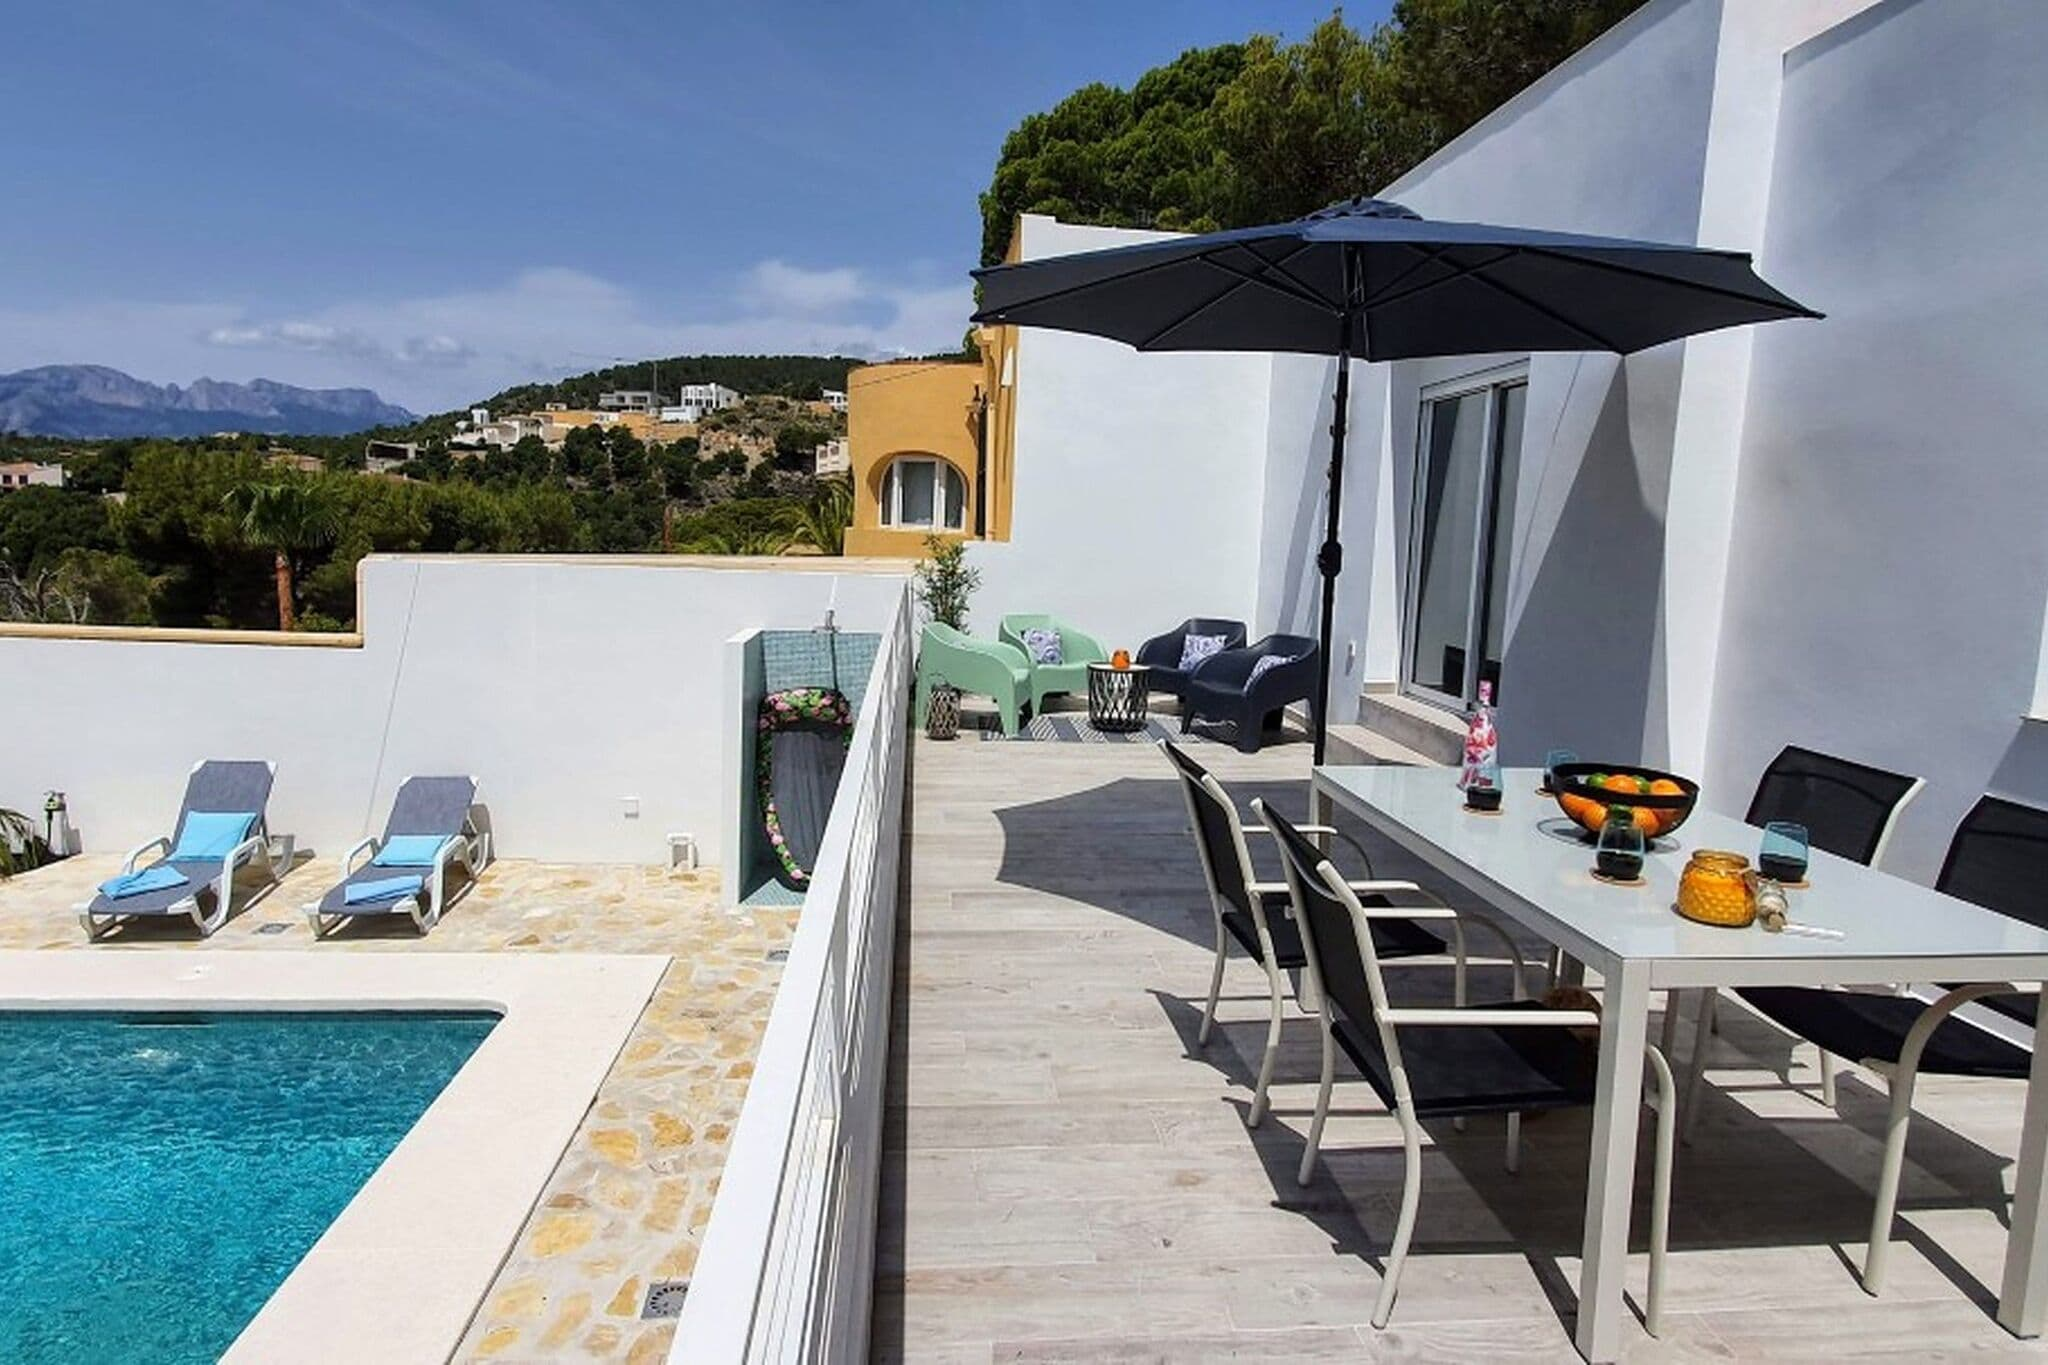 Beautiful holiday home in Altea near the Mediterranean Sea